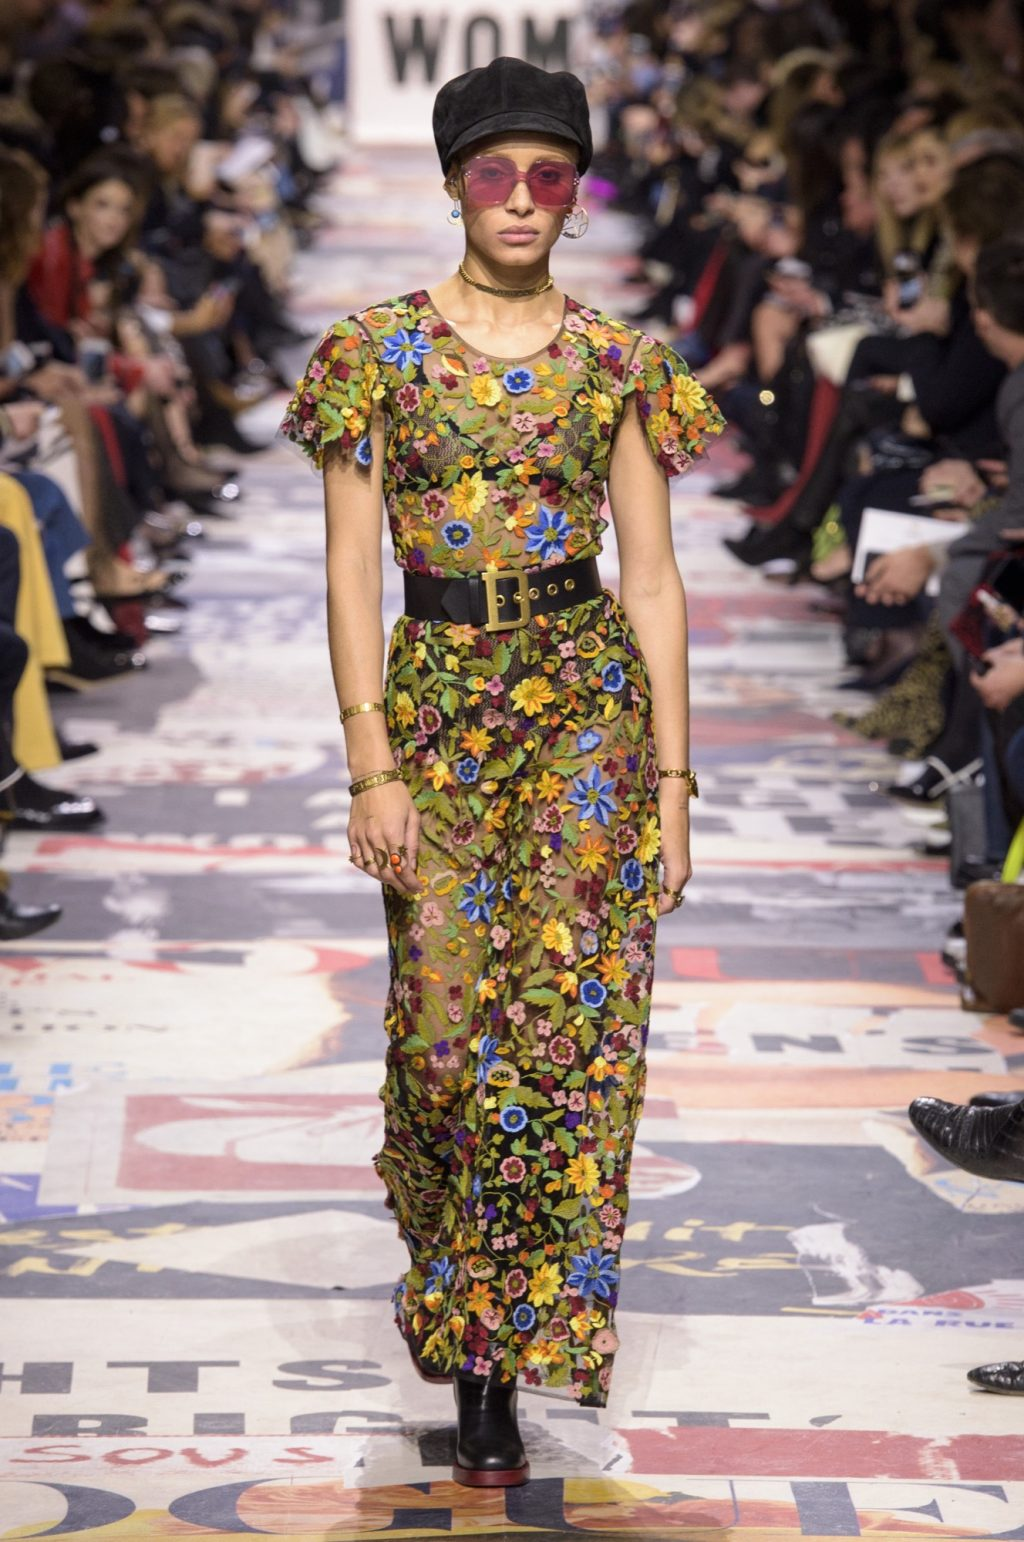 293cd00b0aa68 عرض أزياء ديور موسم خريف شتاء 2018 من أسبوع باريس للموضة - Savoir Flair